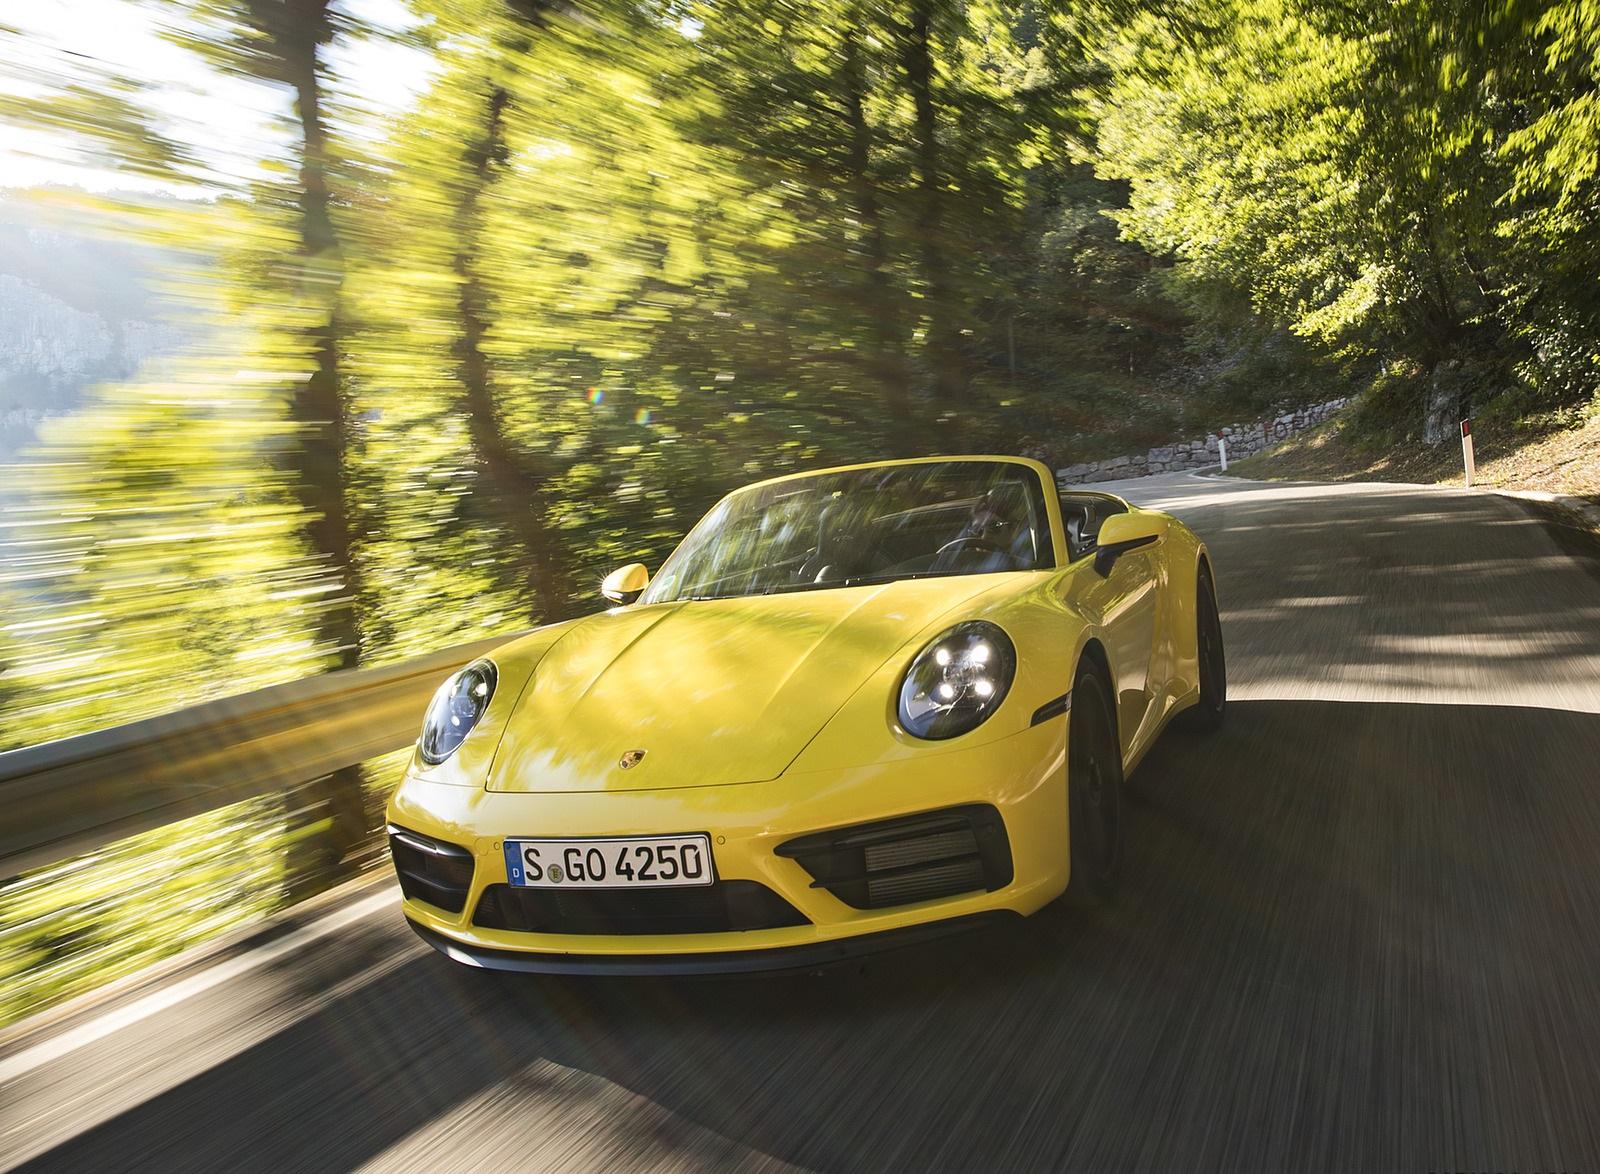 2022 Porsche 911 Carrera GTS Cabriolet (Color: Racing Yellow) Front Wallpapers (5)